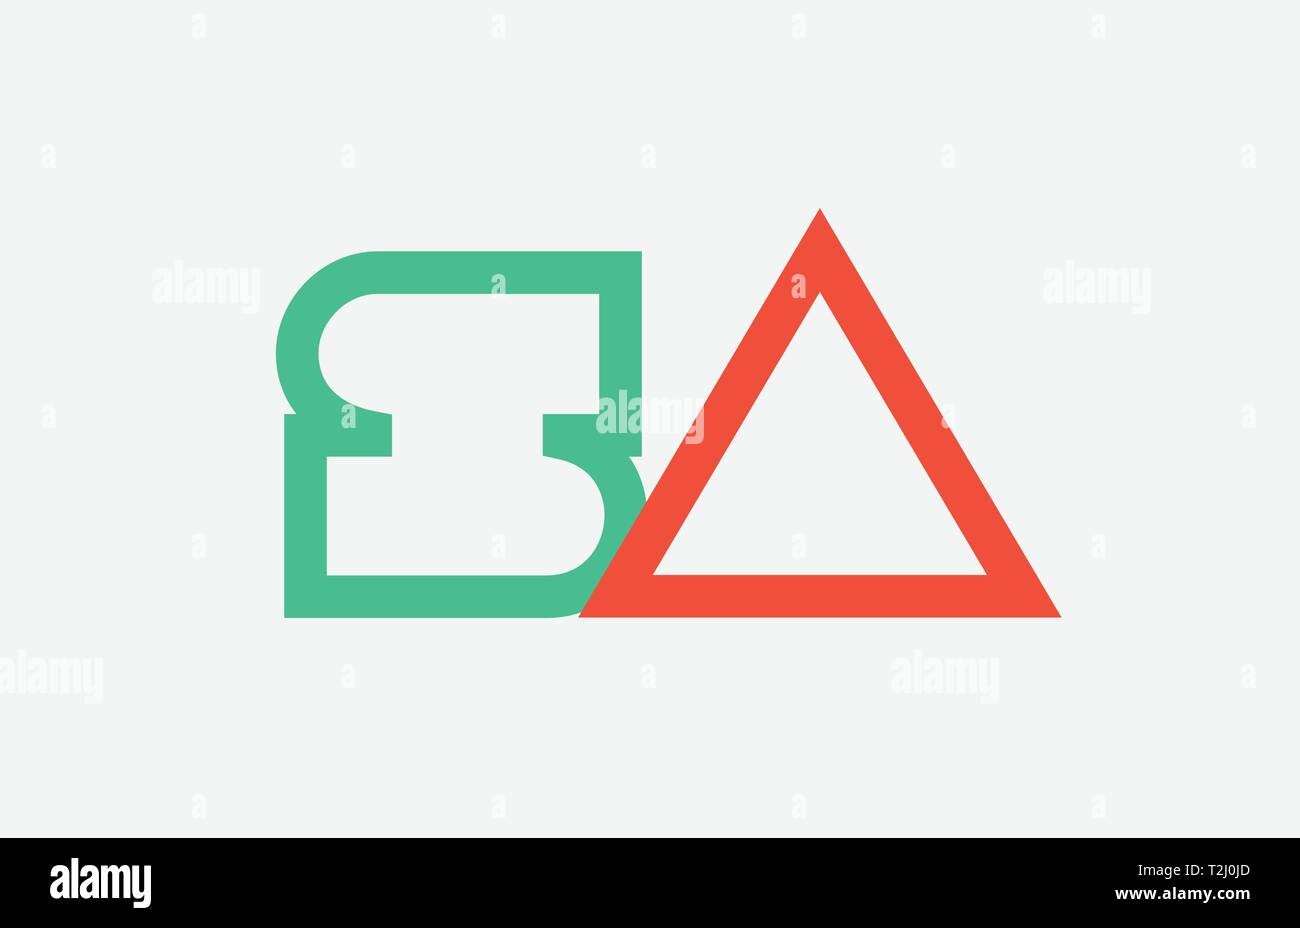 orange green alphabet letter logo combination sa s a design suitable for a company or business Stock Vector